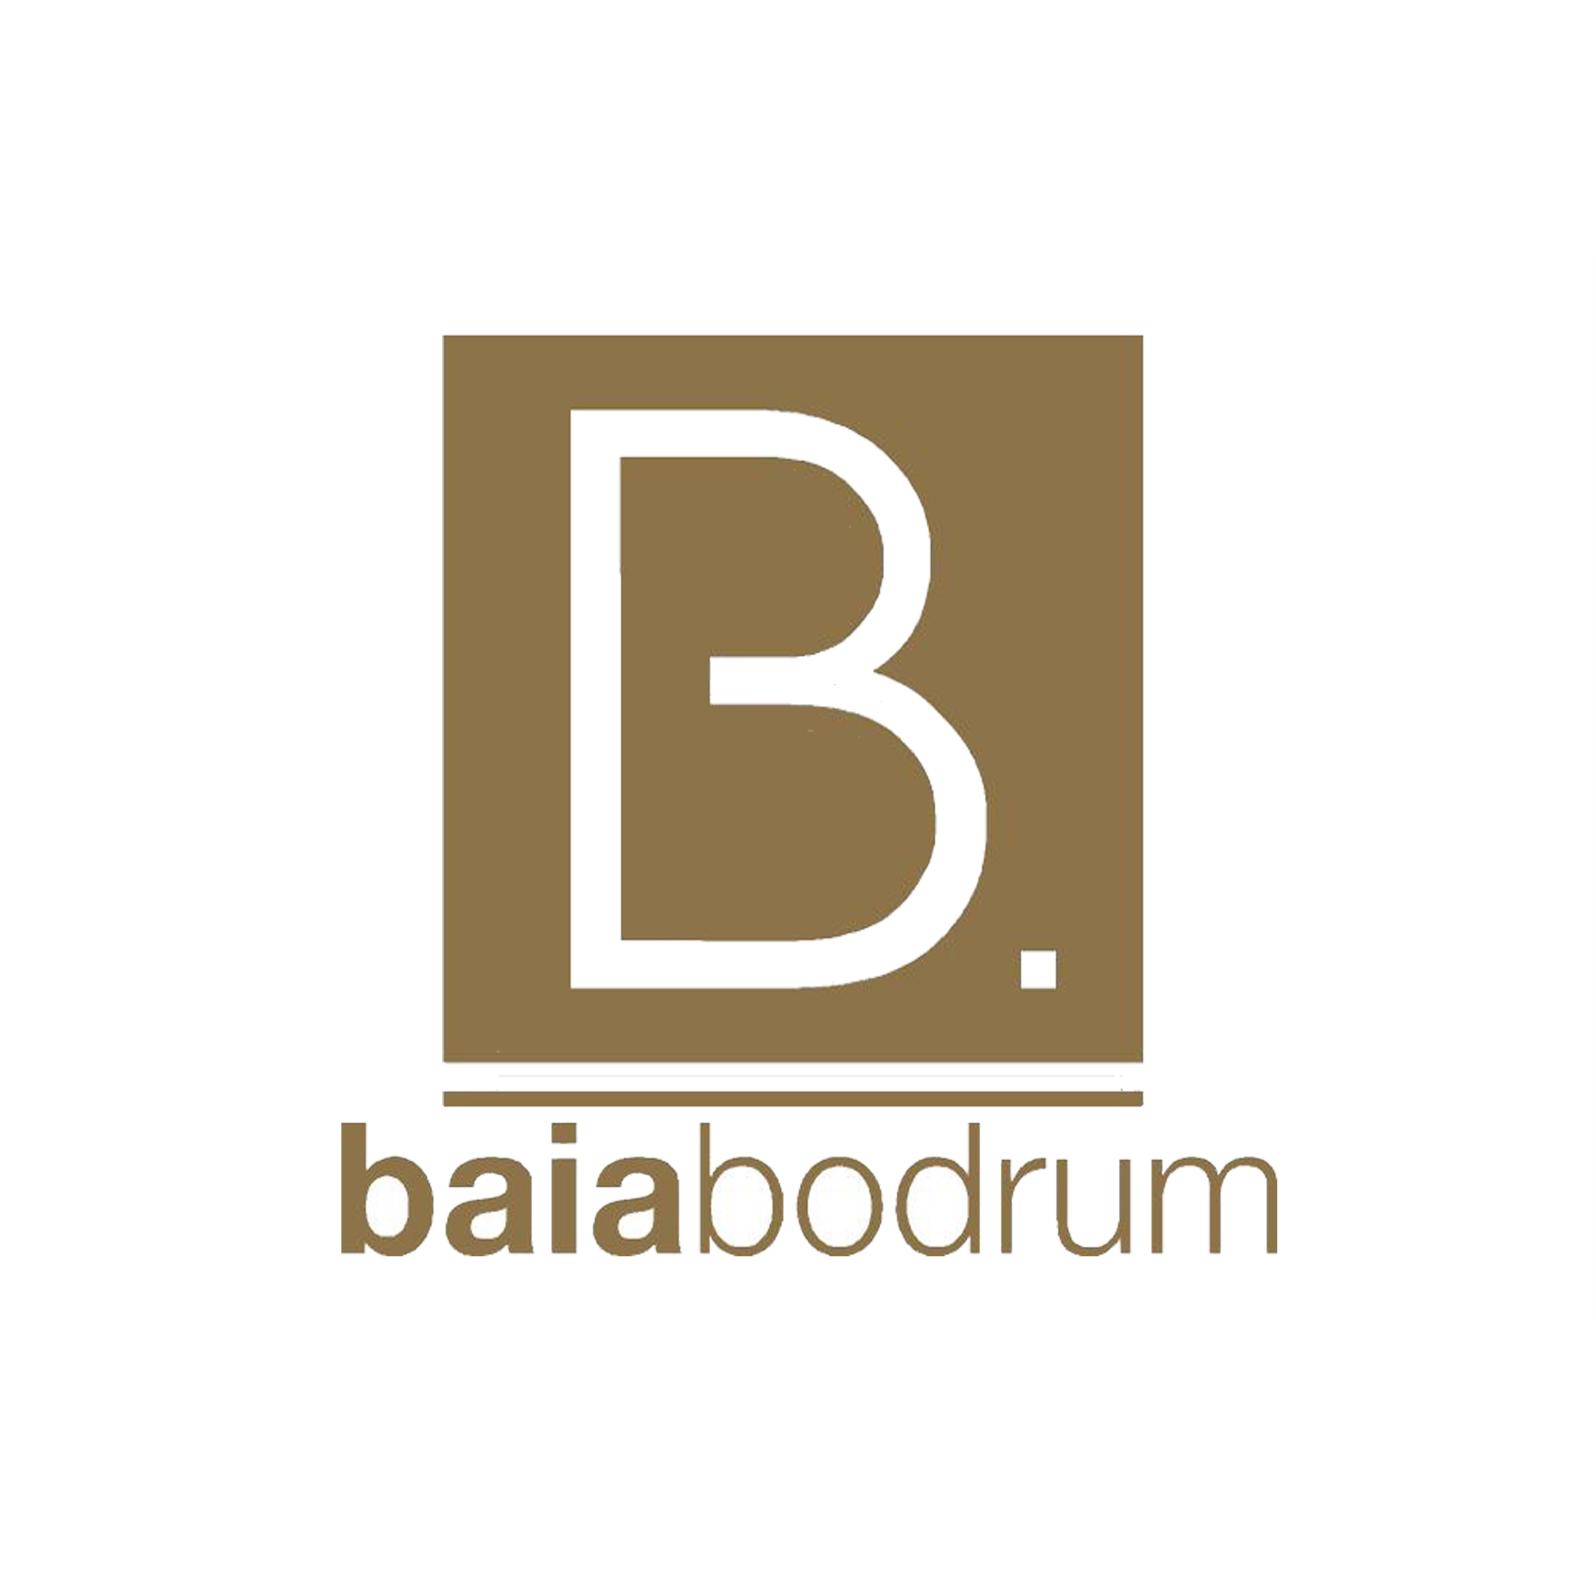 BAIA BODRUM